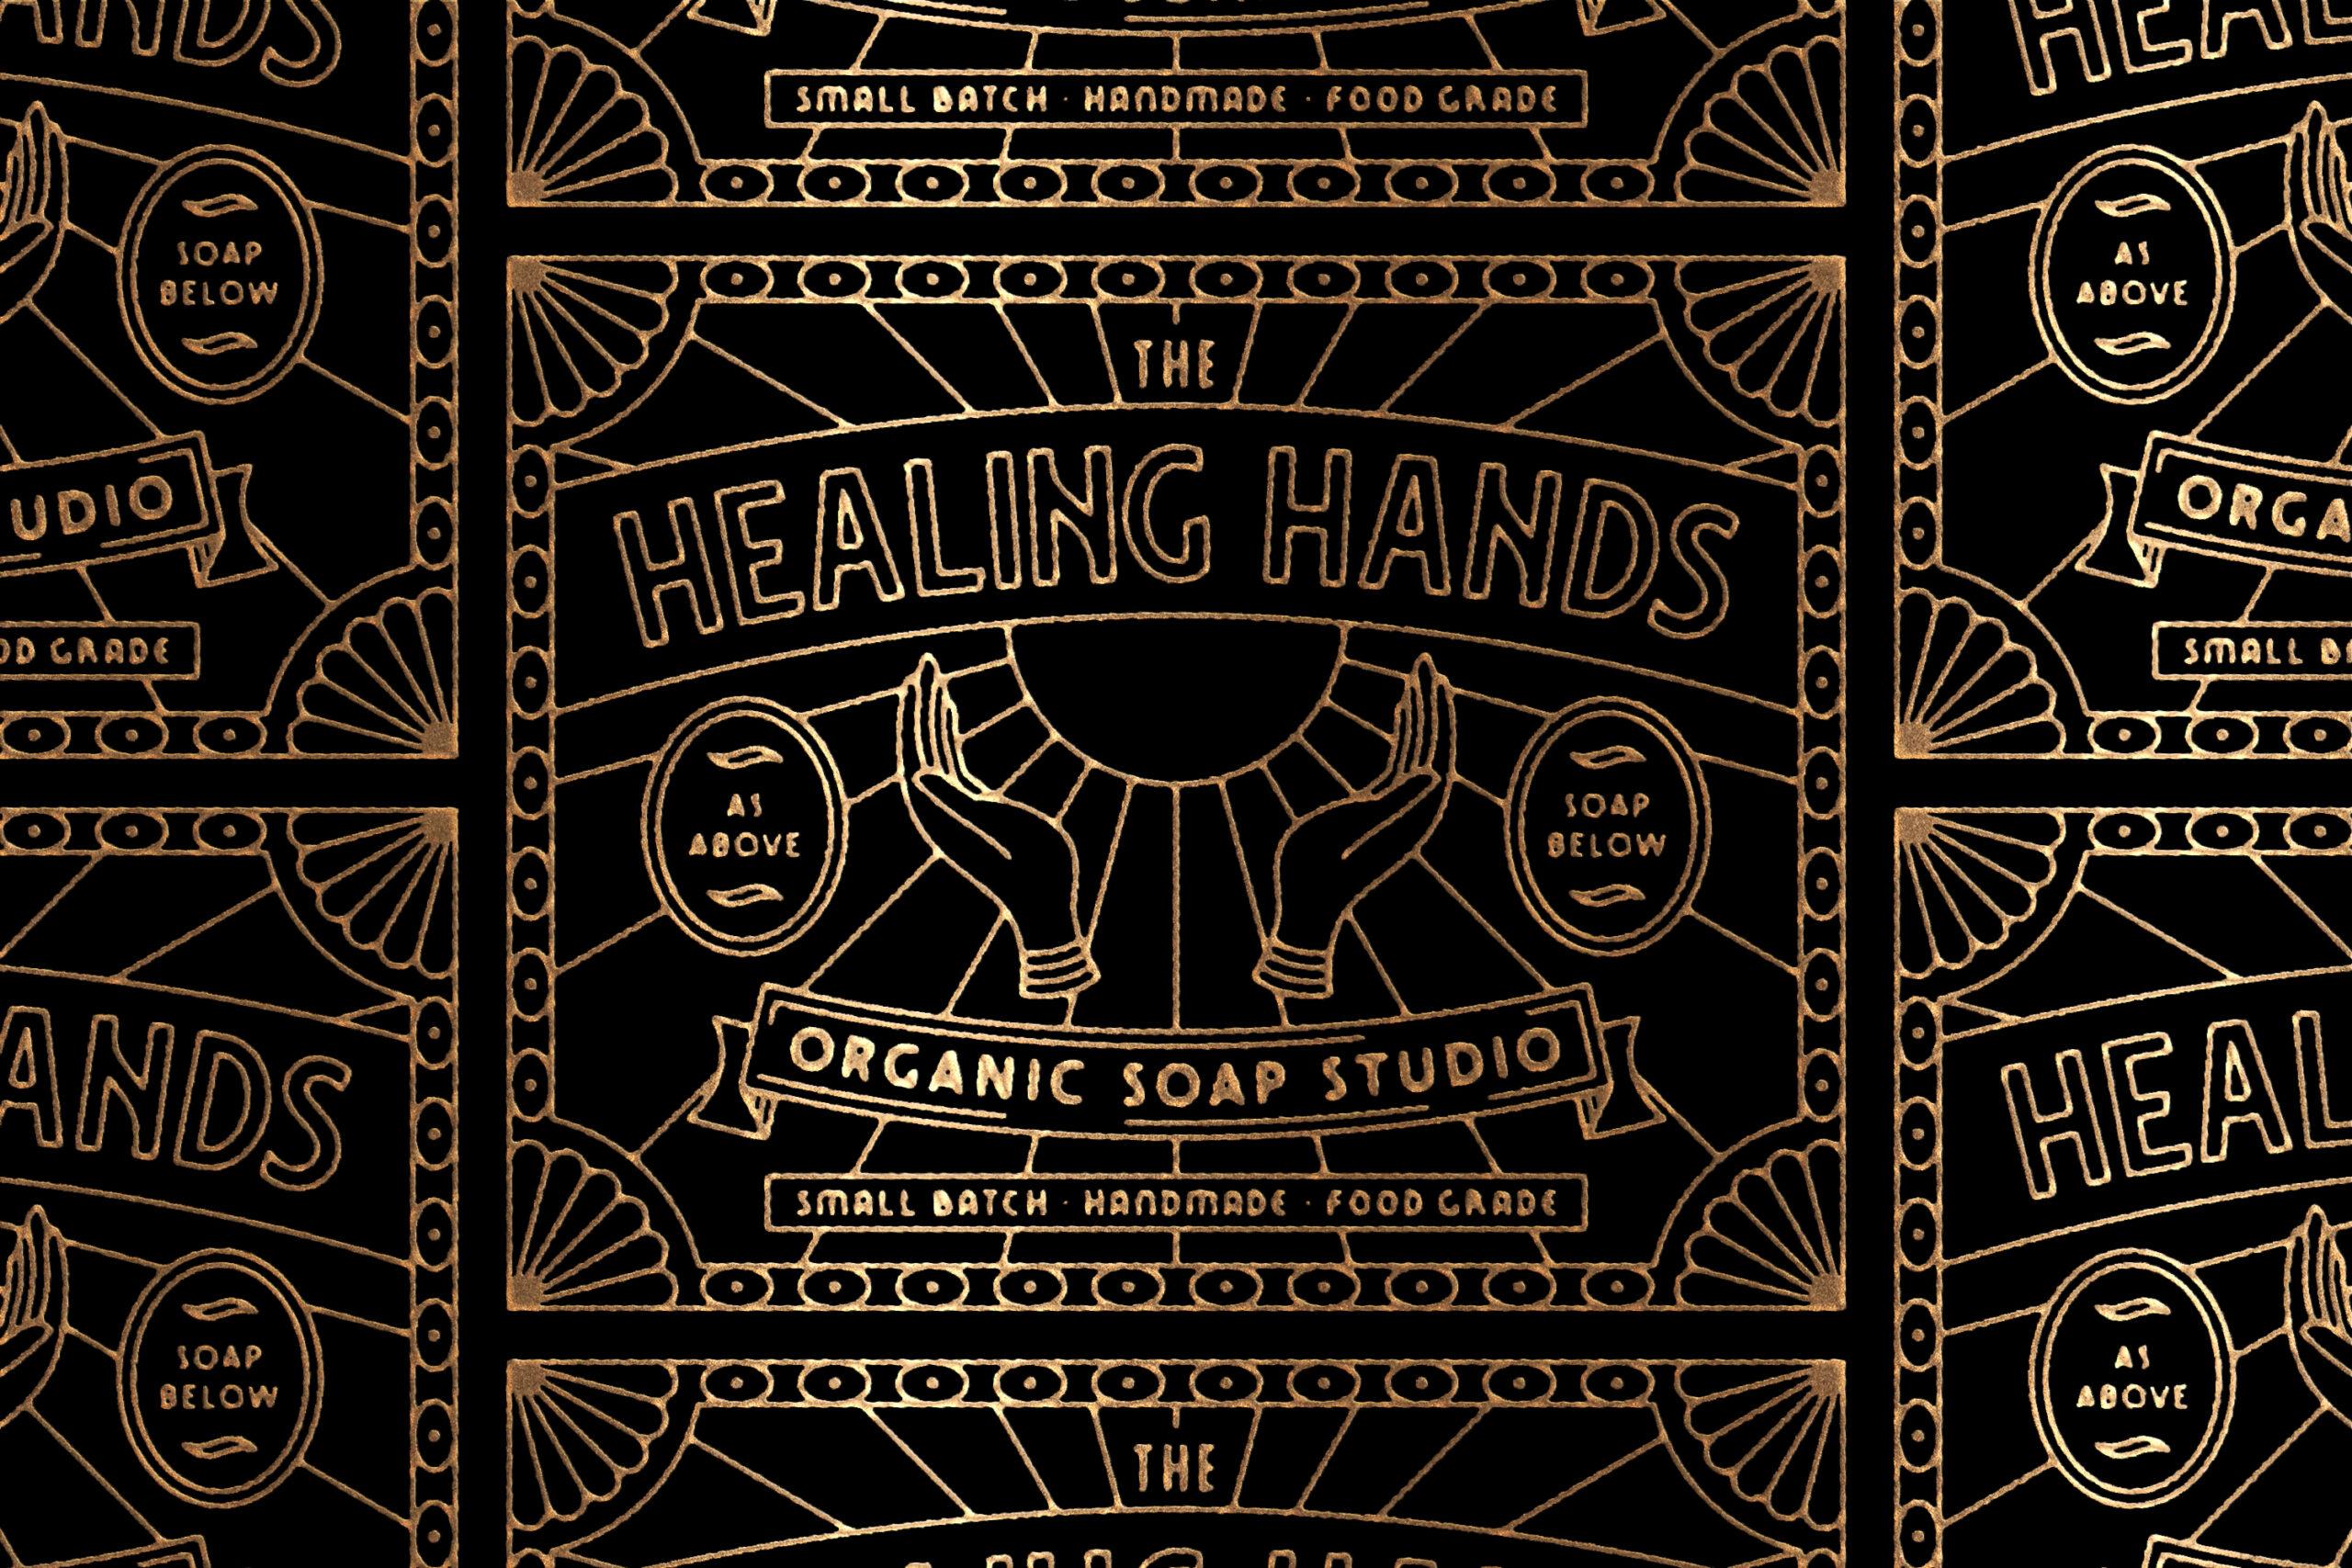 TBS_HealingHands_LabelMetallic_Insta_v1